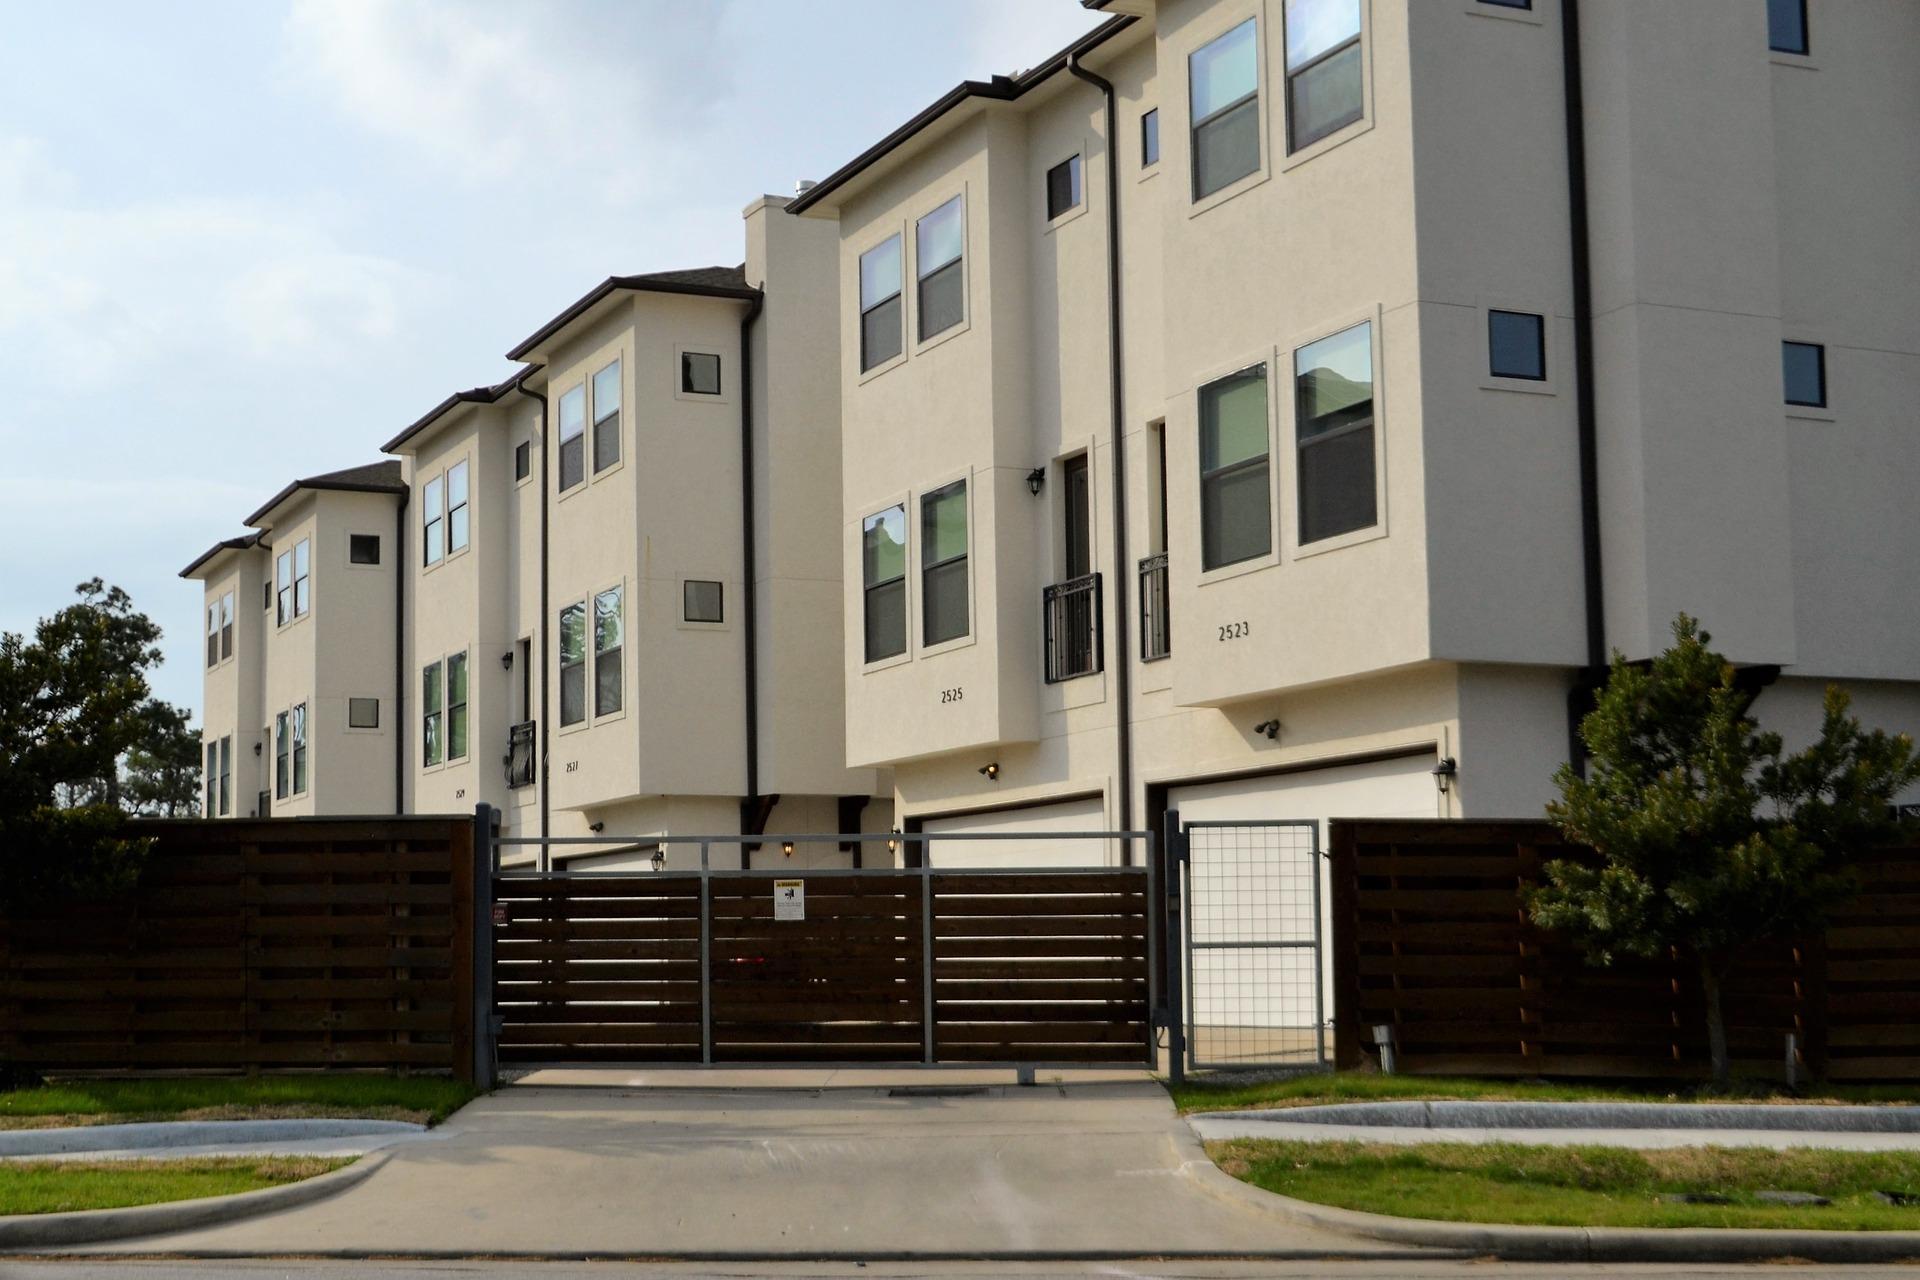 Spareroom to RENT or Duplex Unit for RENT? 3